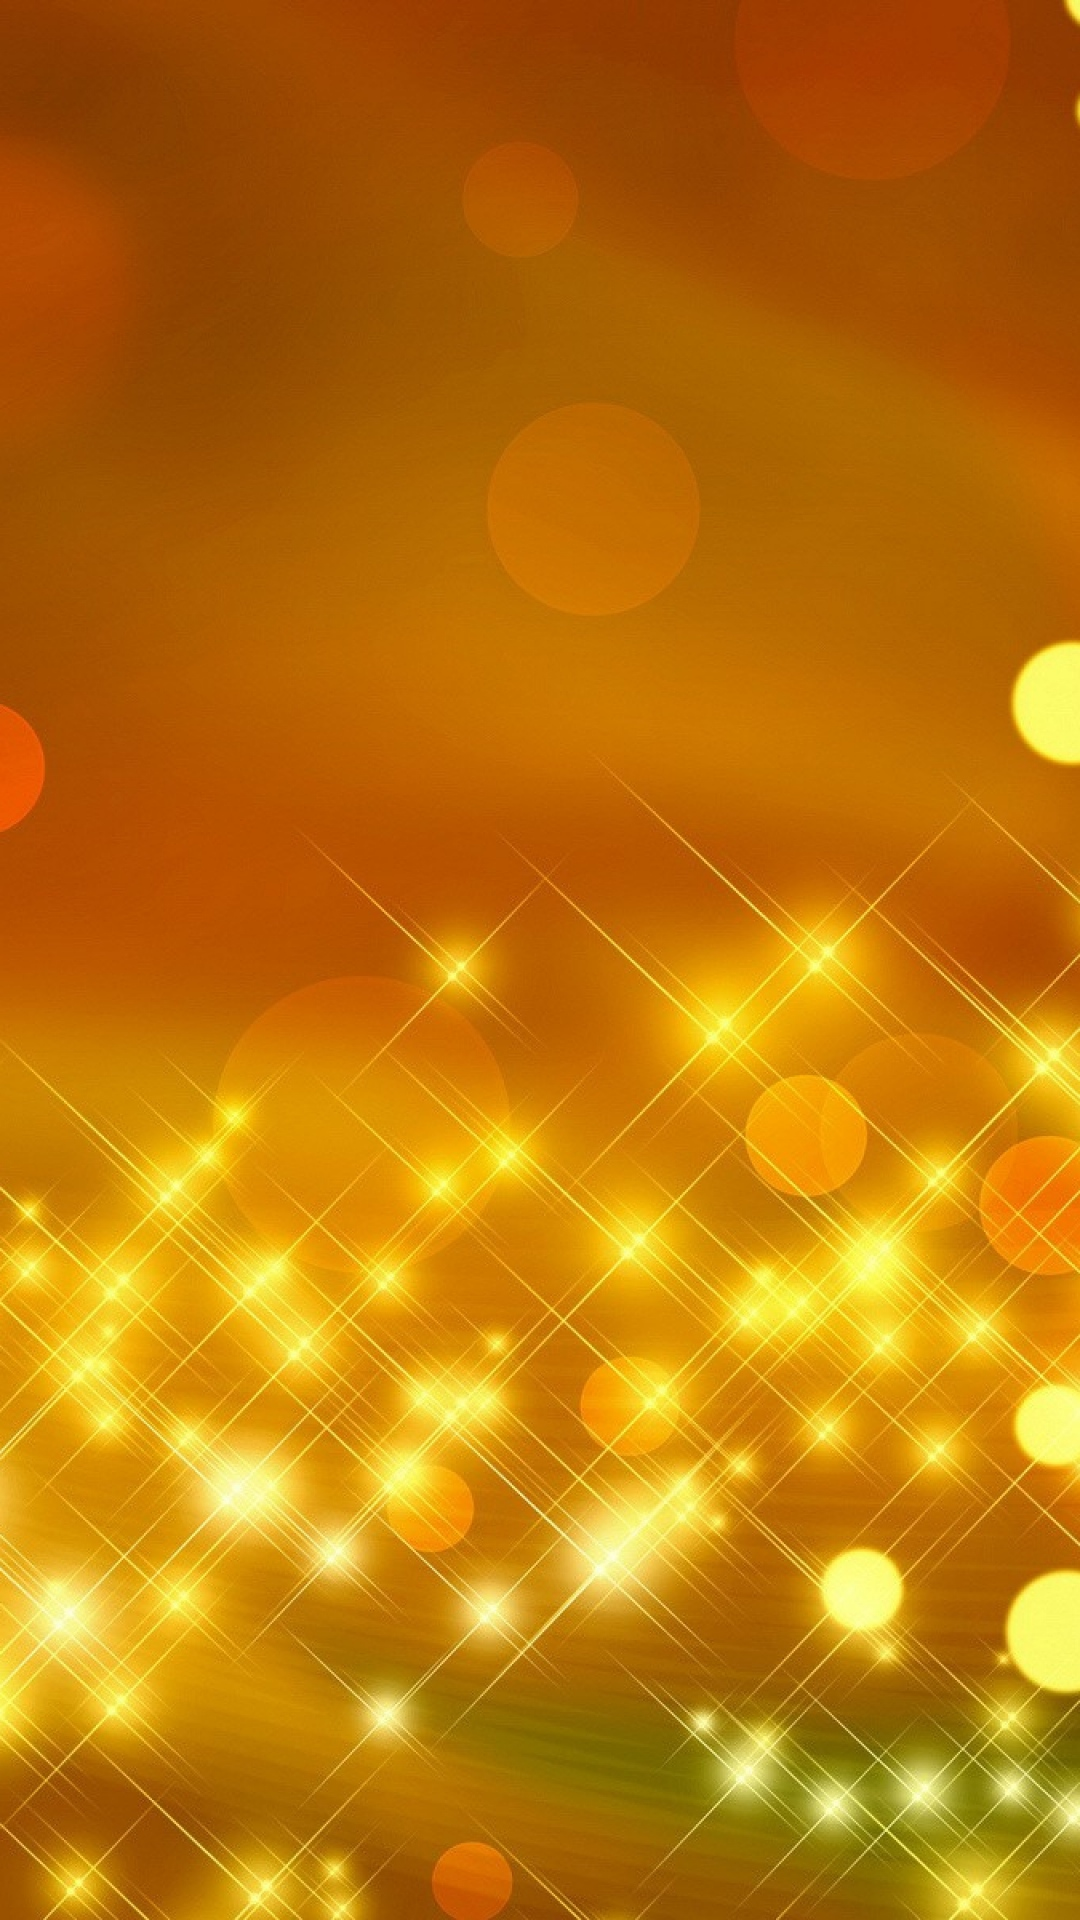 Gold Glitter Particles Iphone Wallpaper Iphone Wallpaper